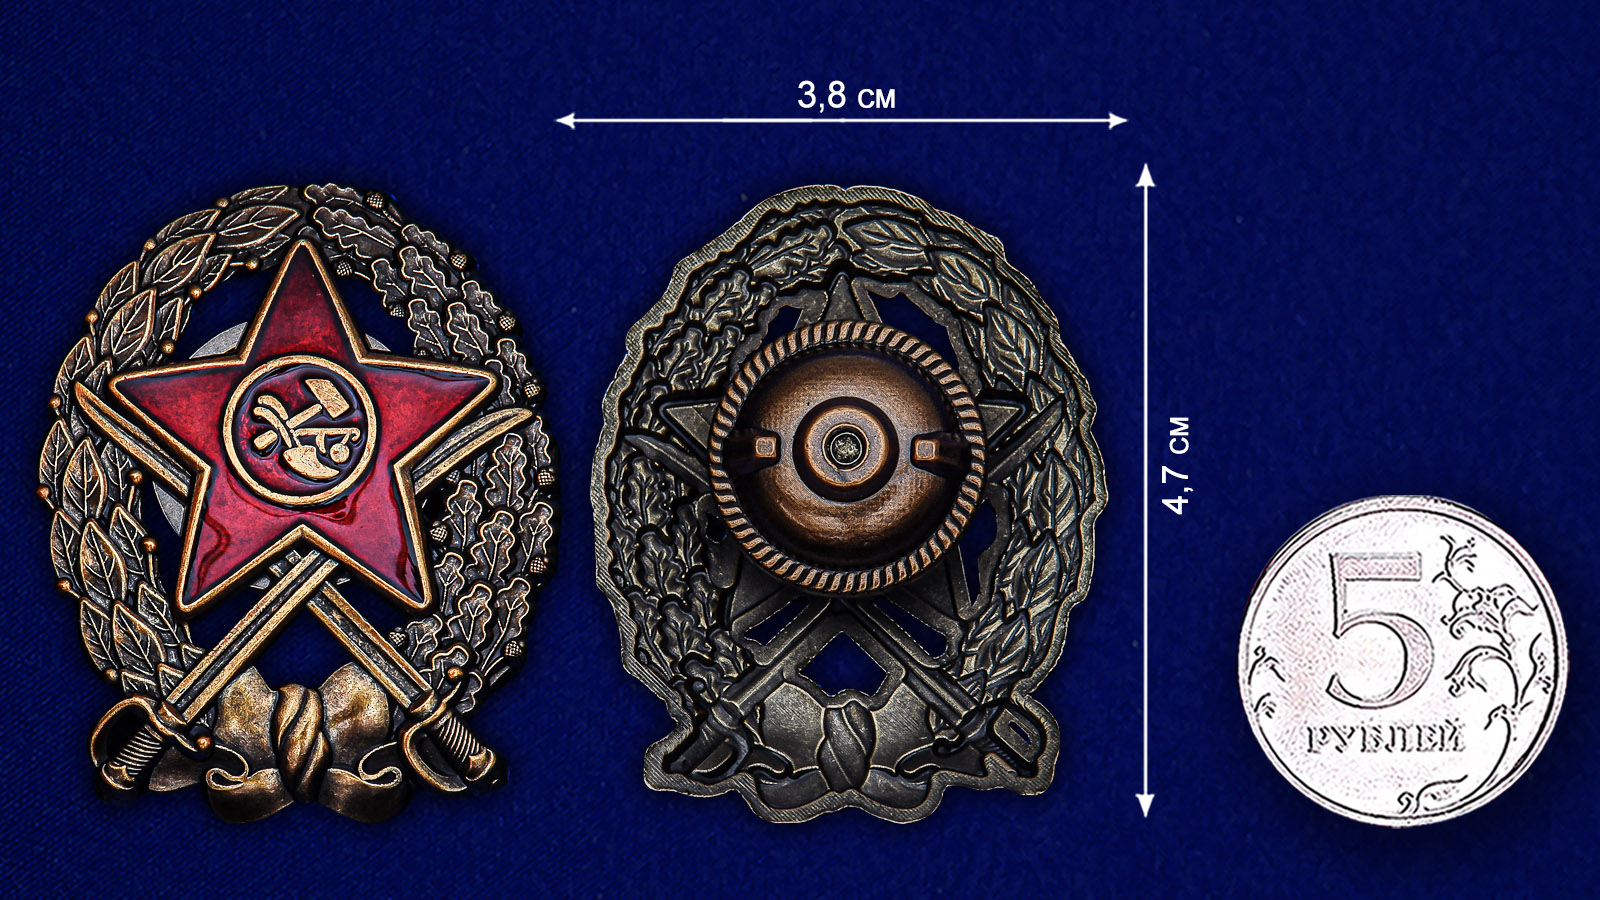 Знак Красного Командира кавалерийских частей РККА - размер